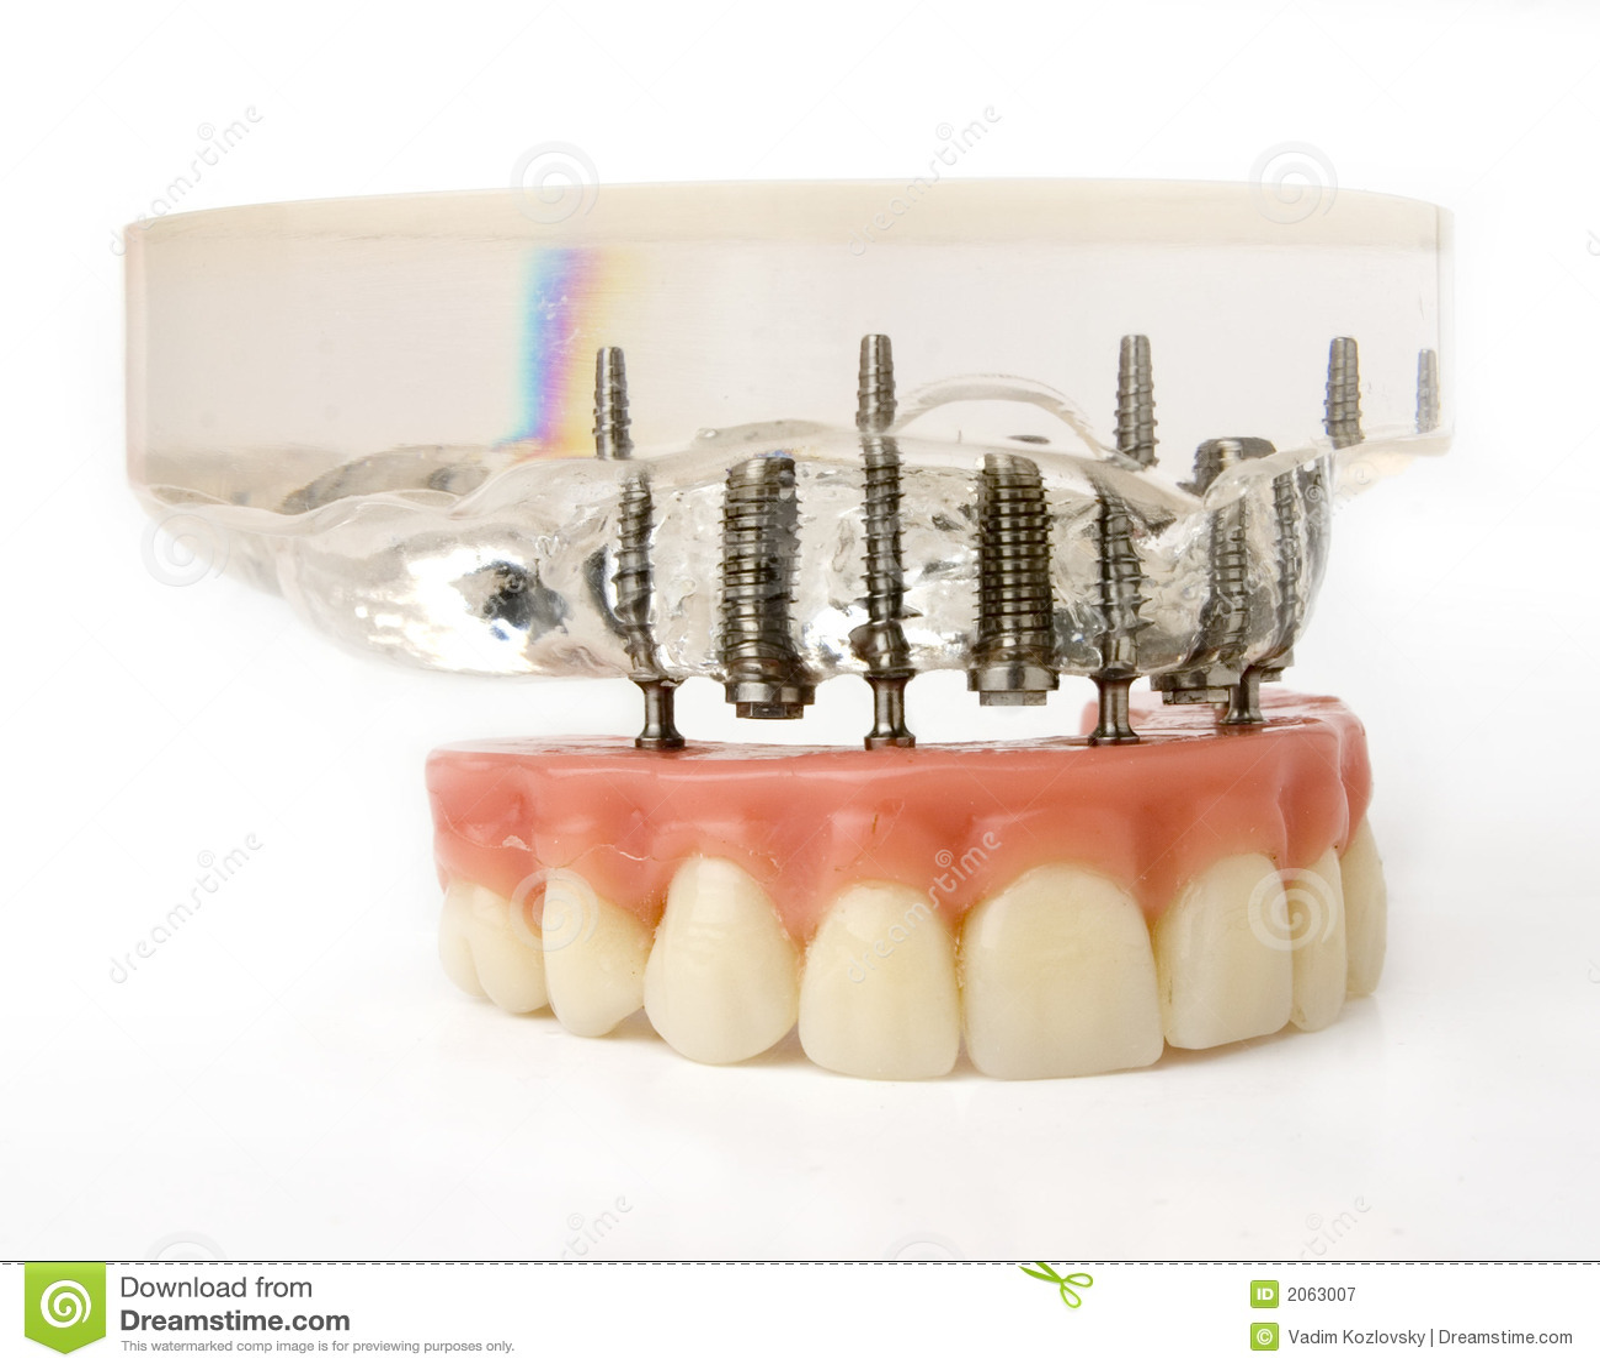 Implants model